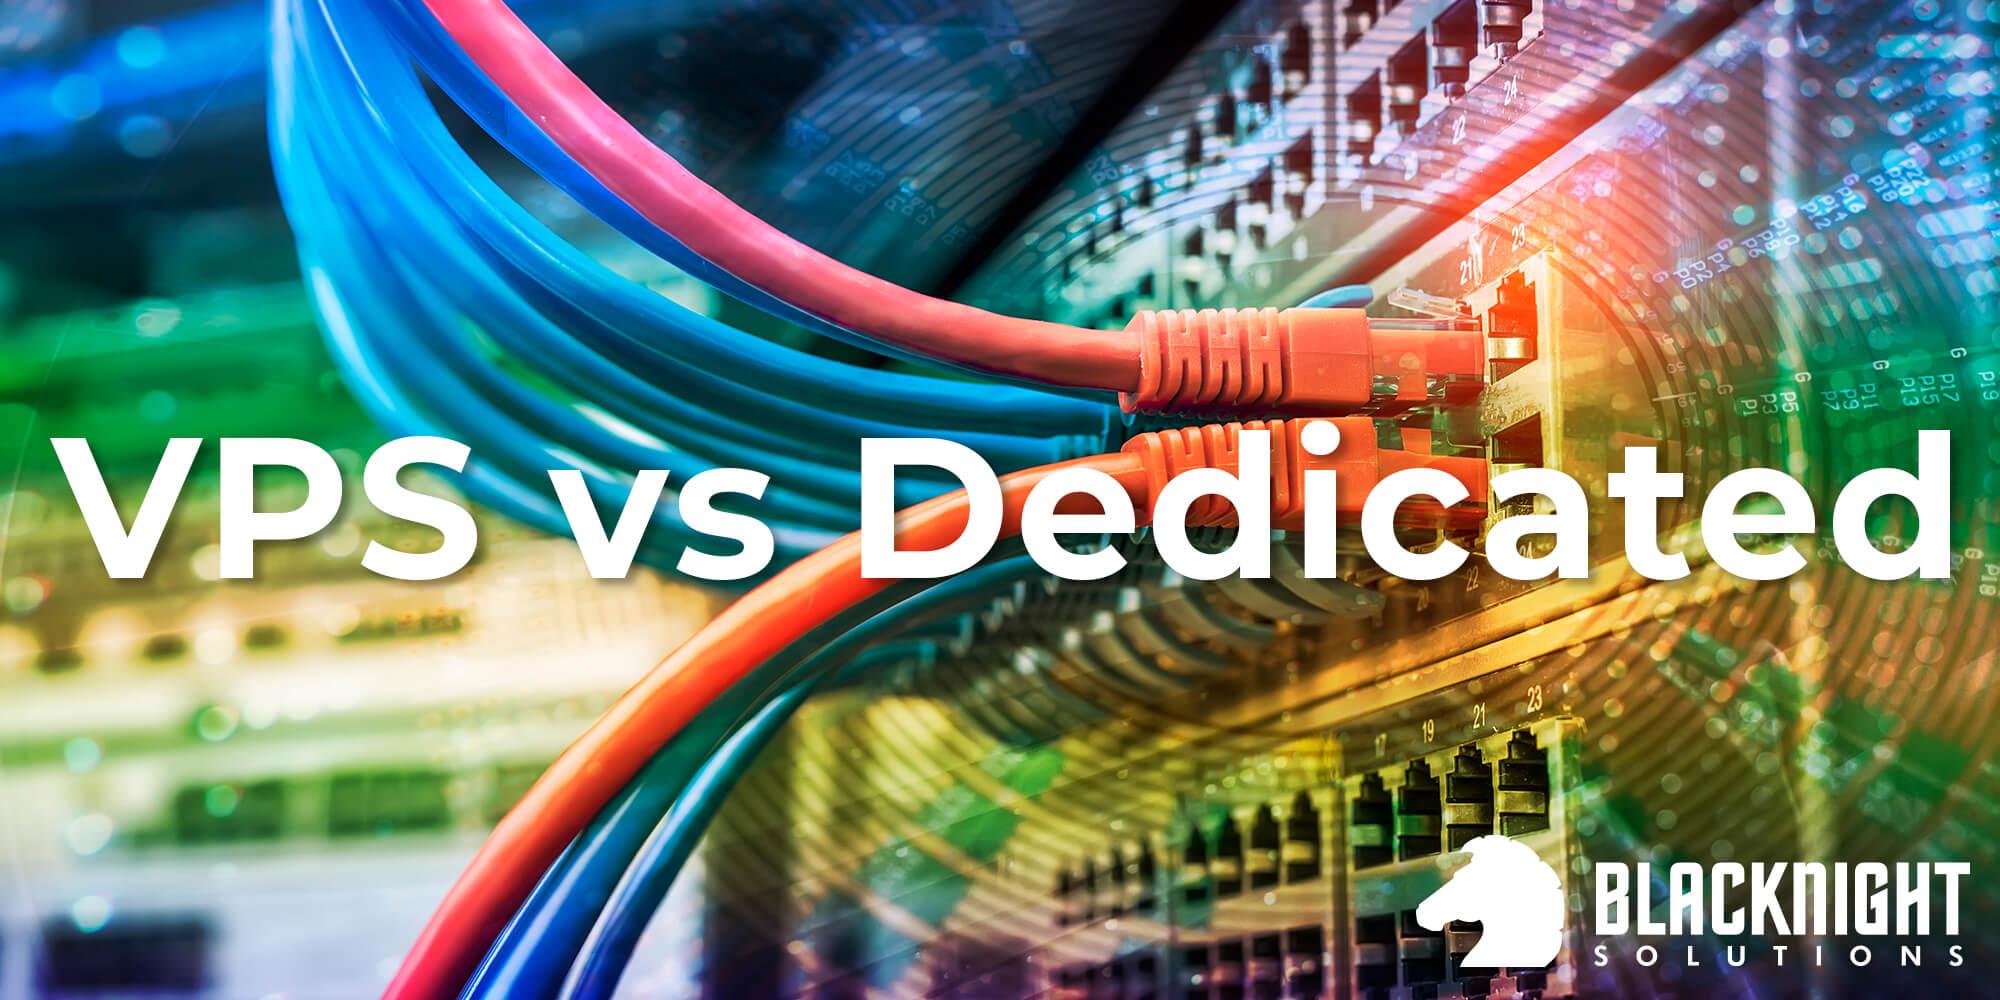 blacknight-vps-vs-dedicated-why-choose